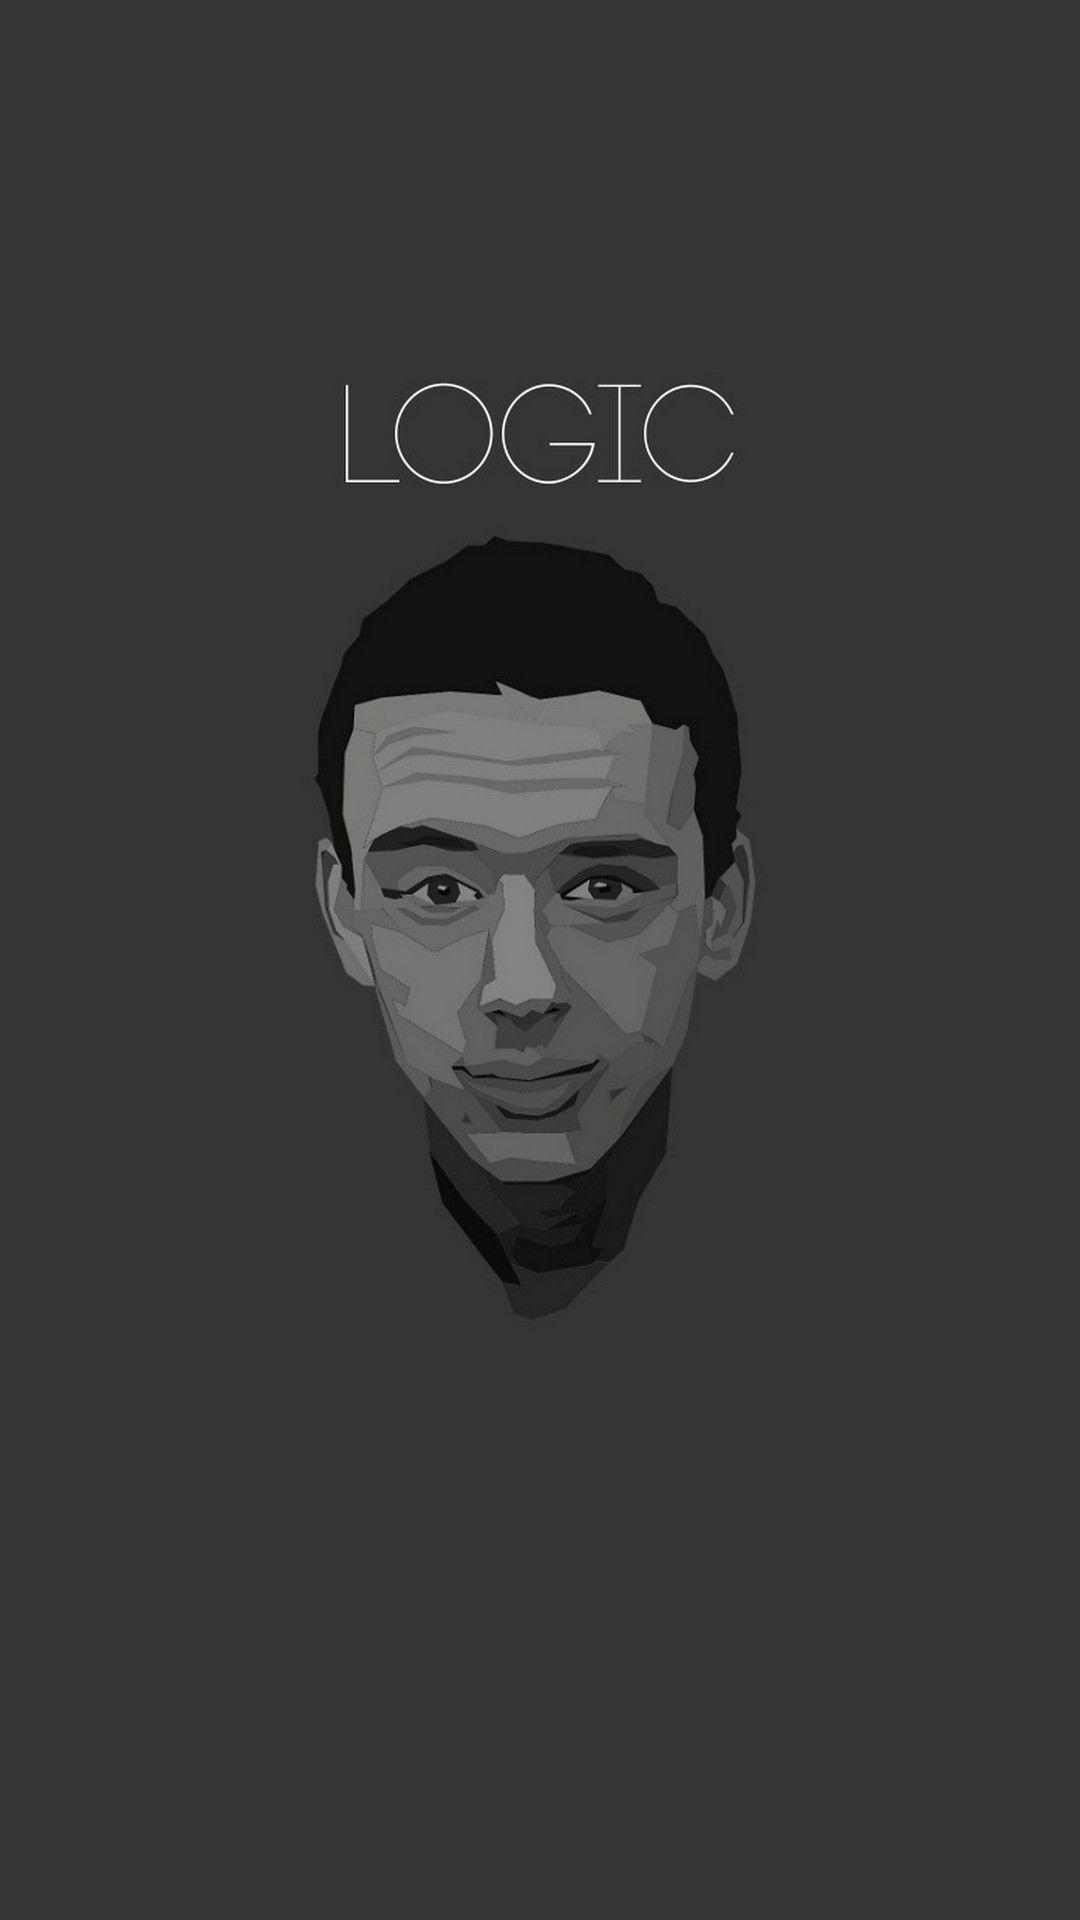 Wallpaper Logic Rapper Iphone Best Iphone Wallpaper Logic Rapper Joyner Lucas Logic Rapper Wallpaper